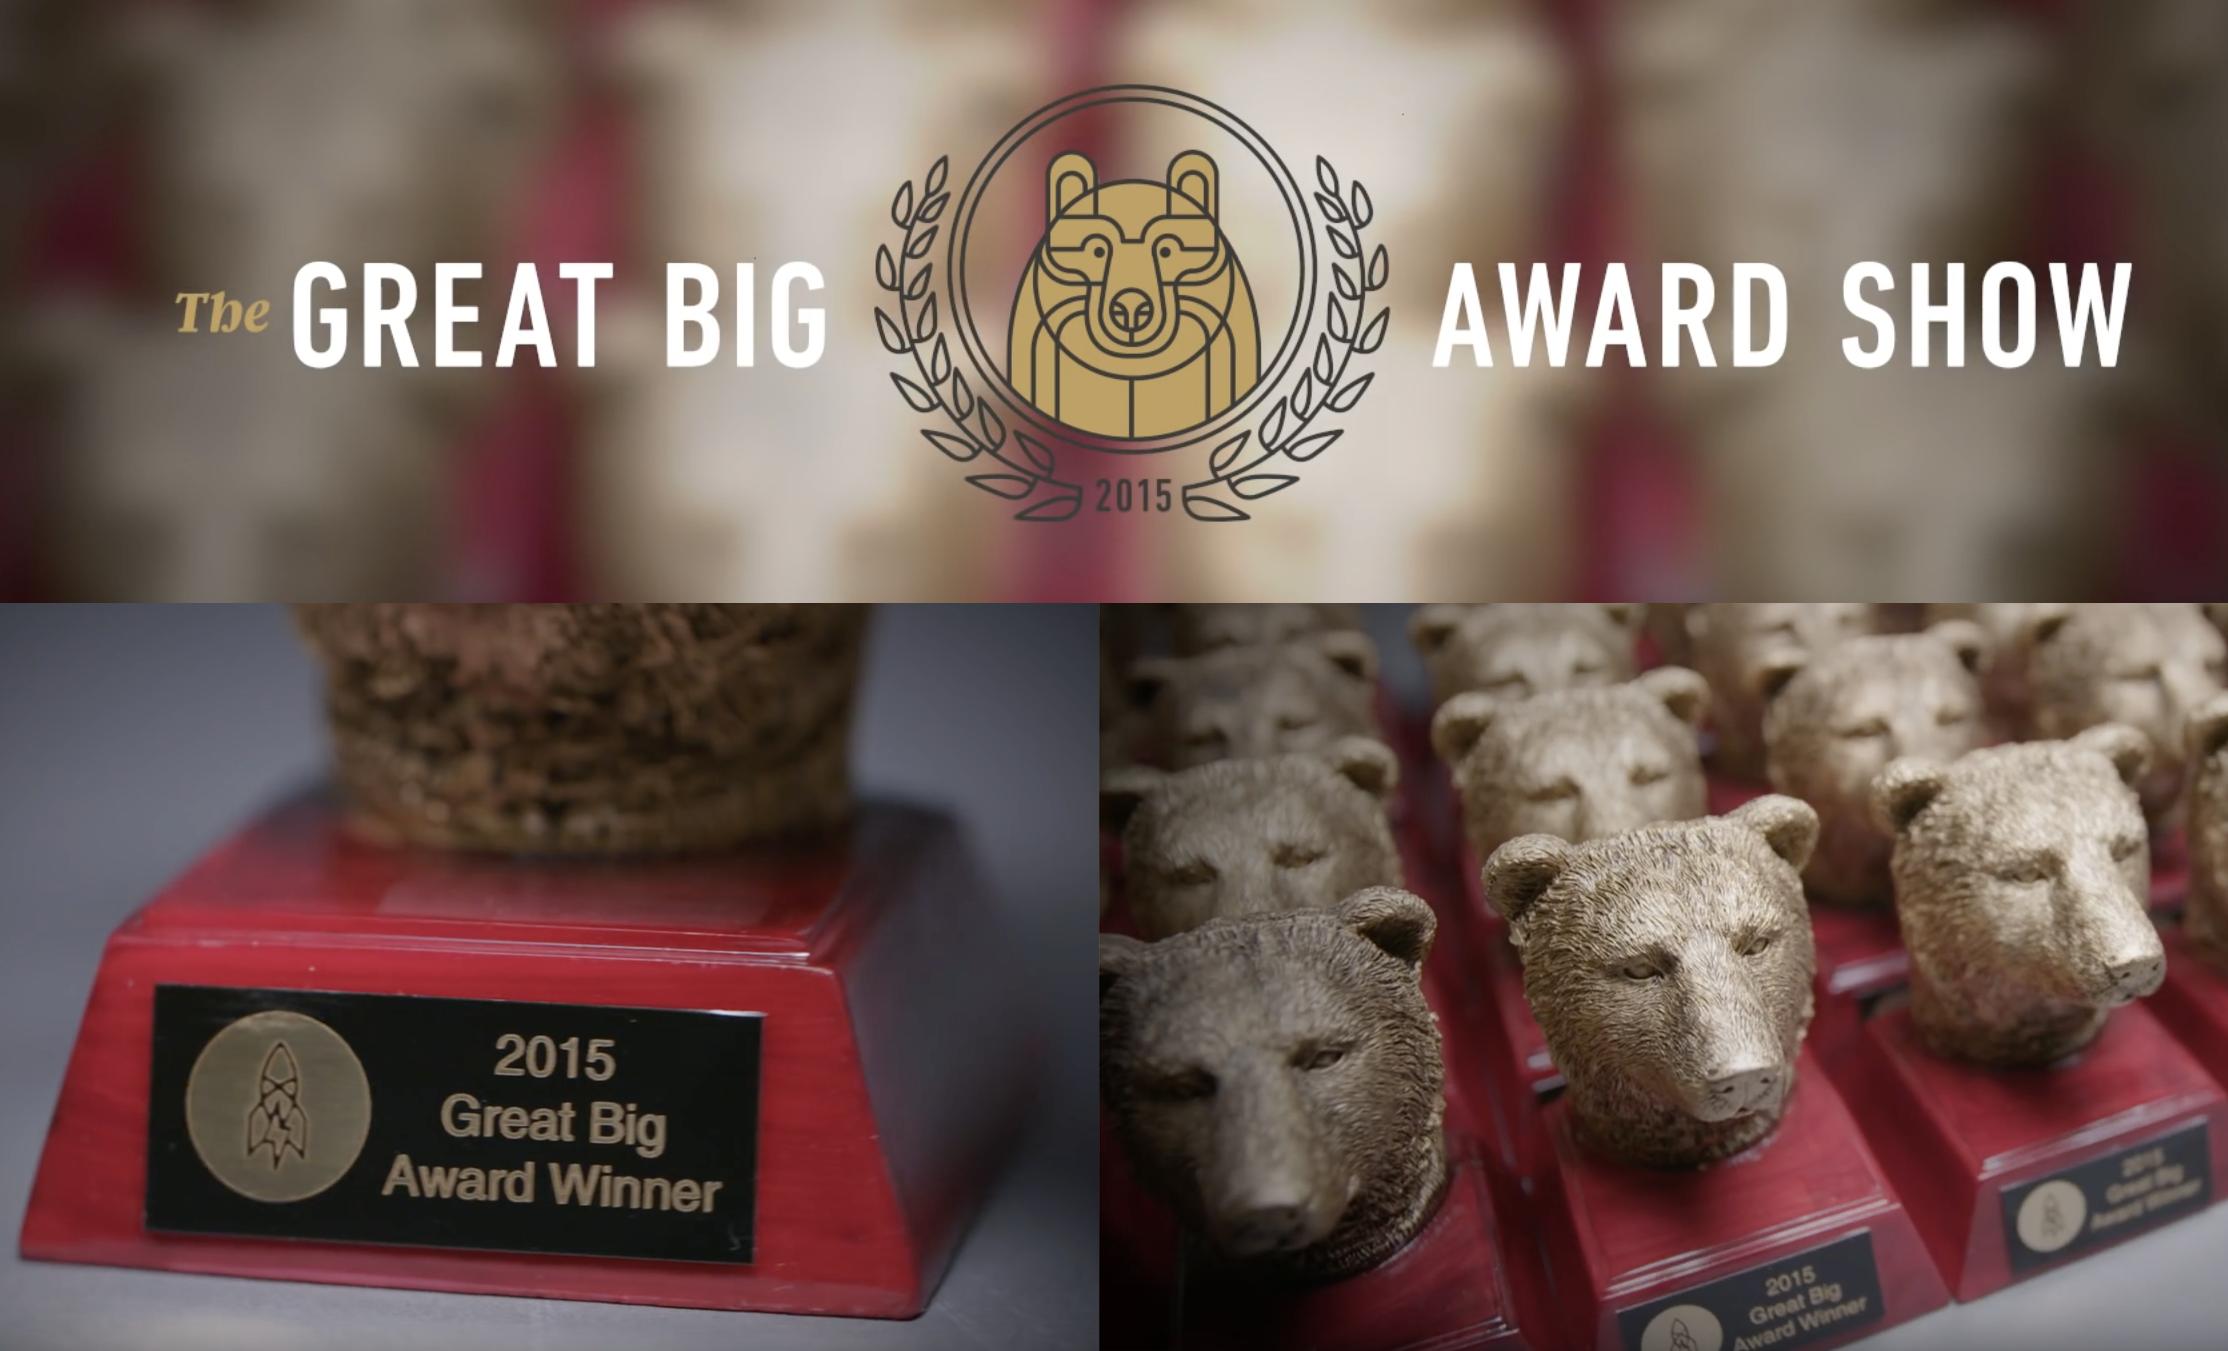 Winner of CNN's Great Big Story Awards 2015 - Best Teenager Film